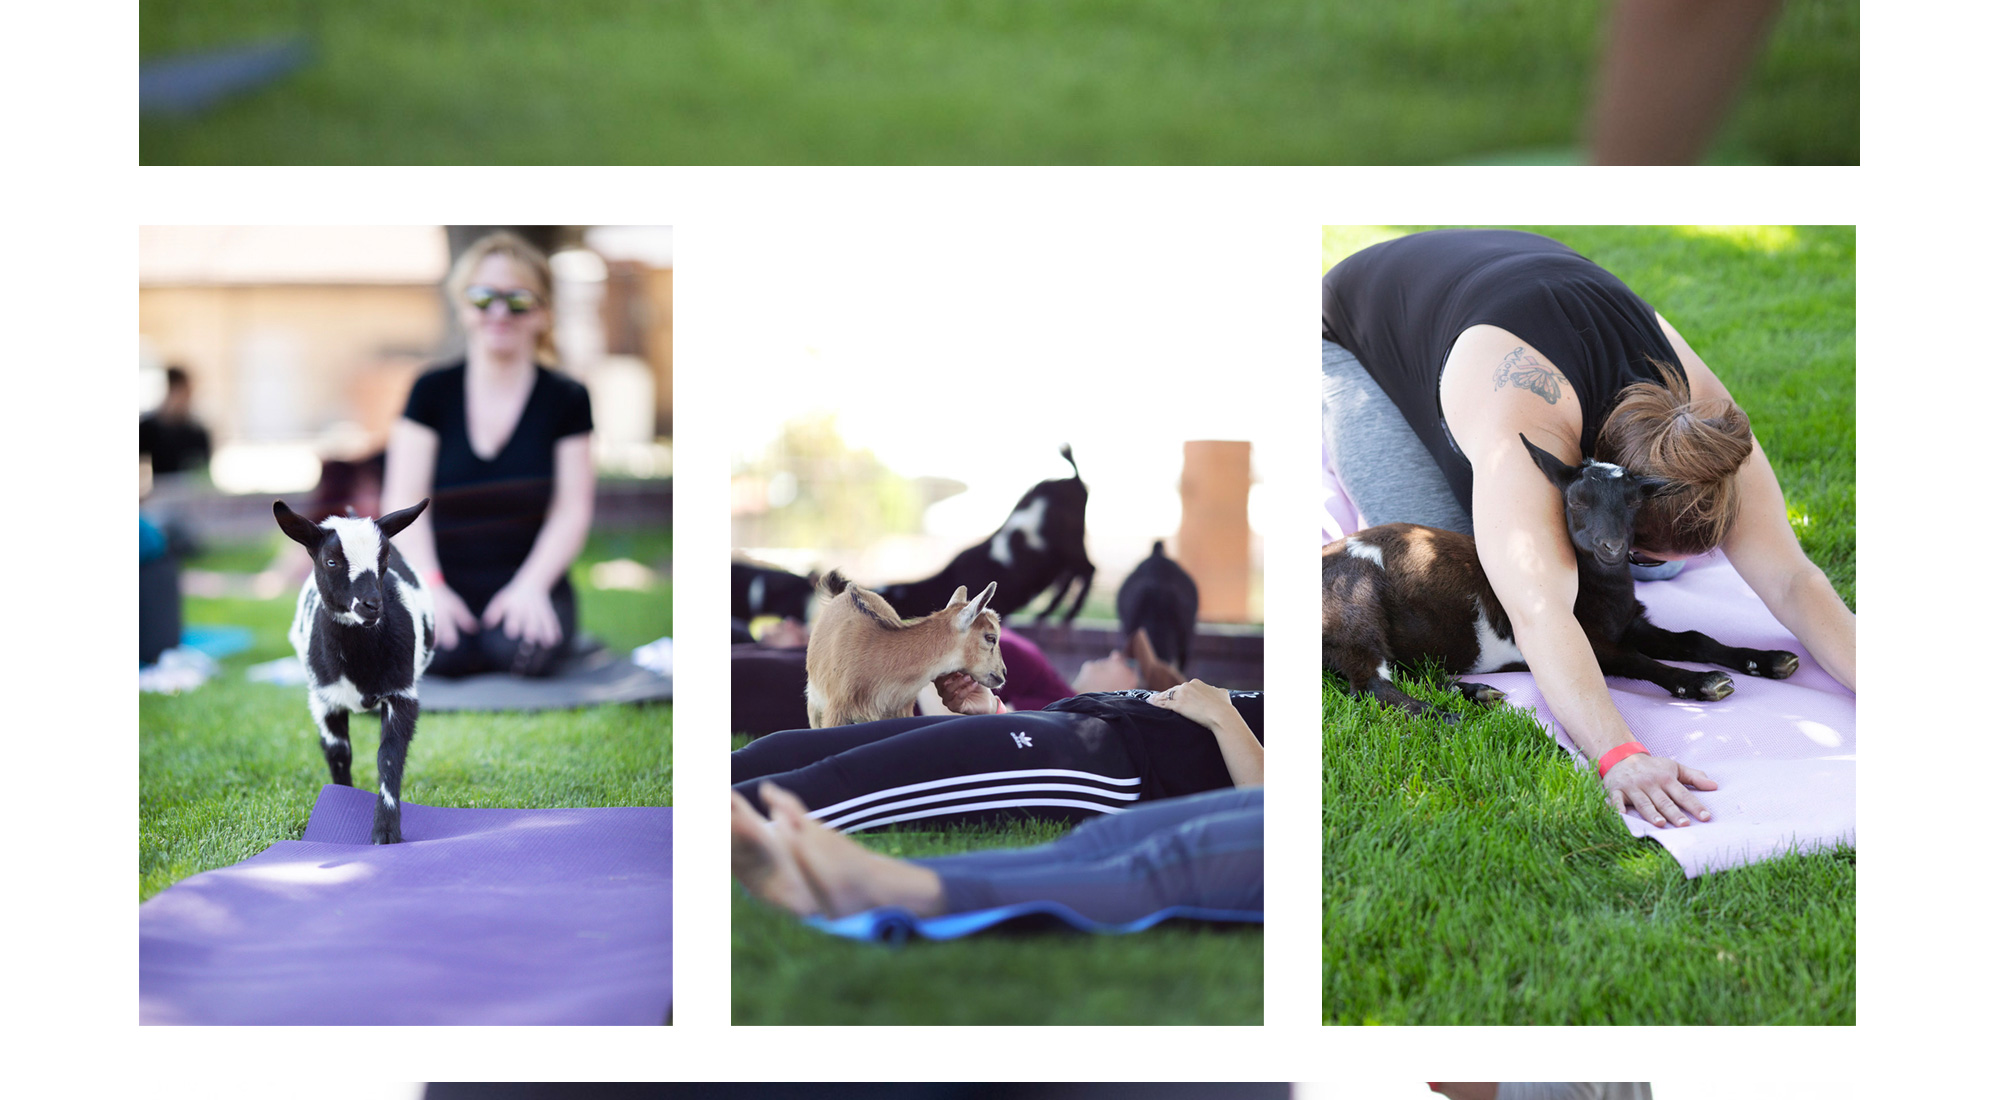 Flying Feets Farm - Goat Yoga